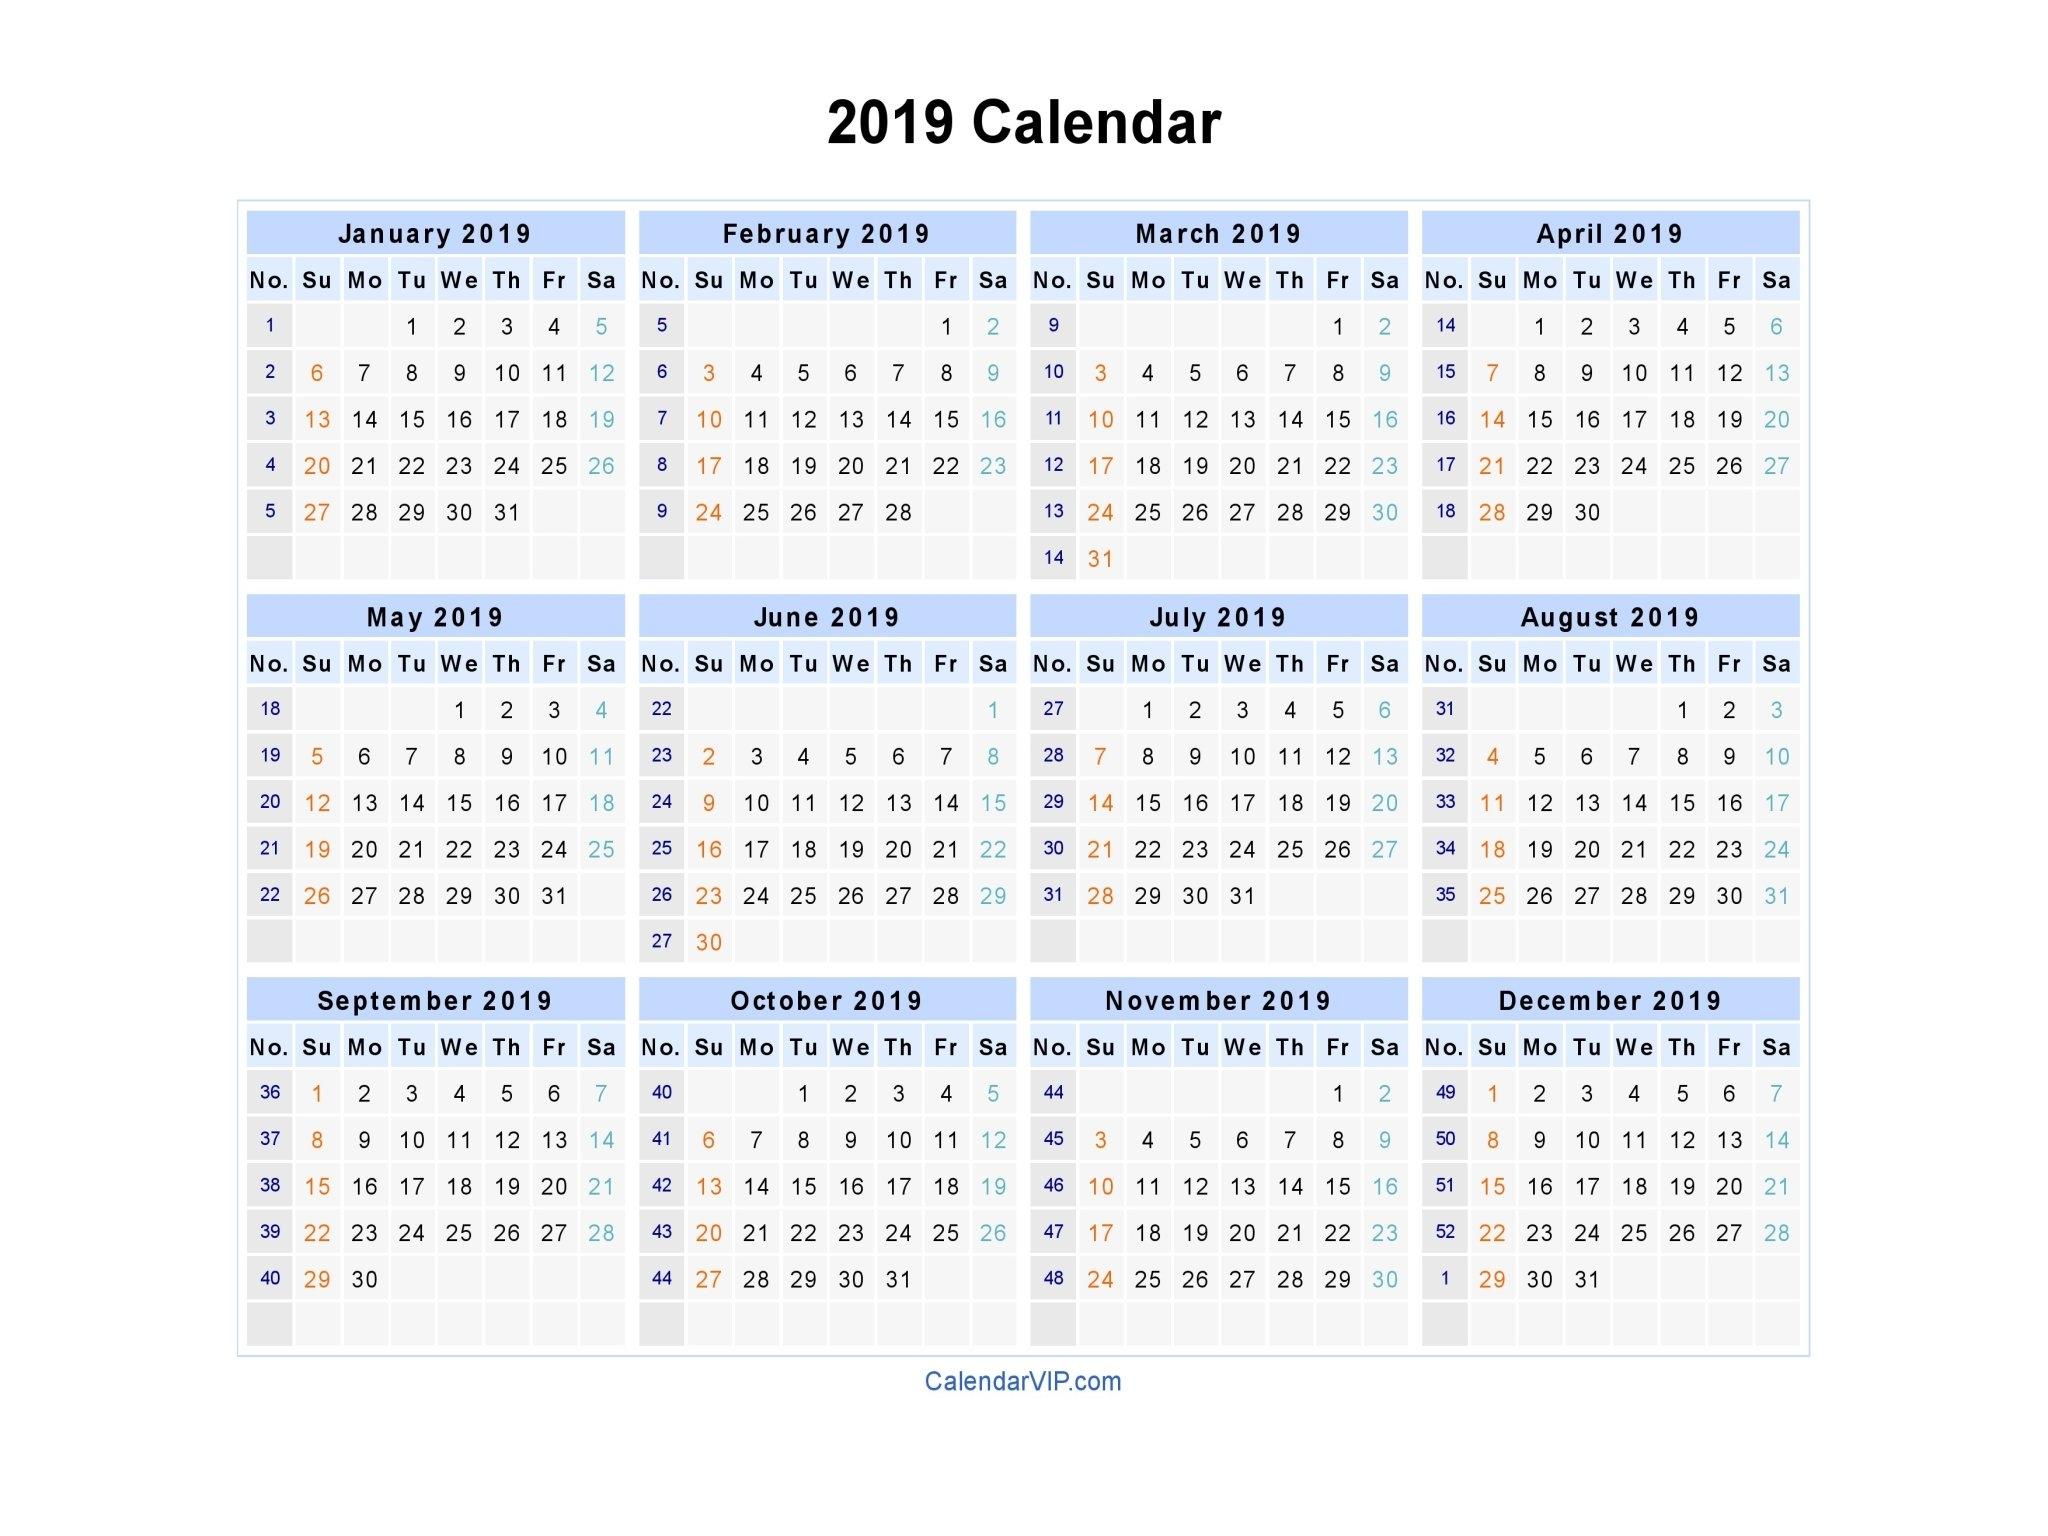 2019 Calendar - Blank Printable Calendar Template In Pdf Word Excel Calendar 2019 Doc